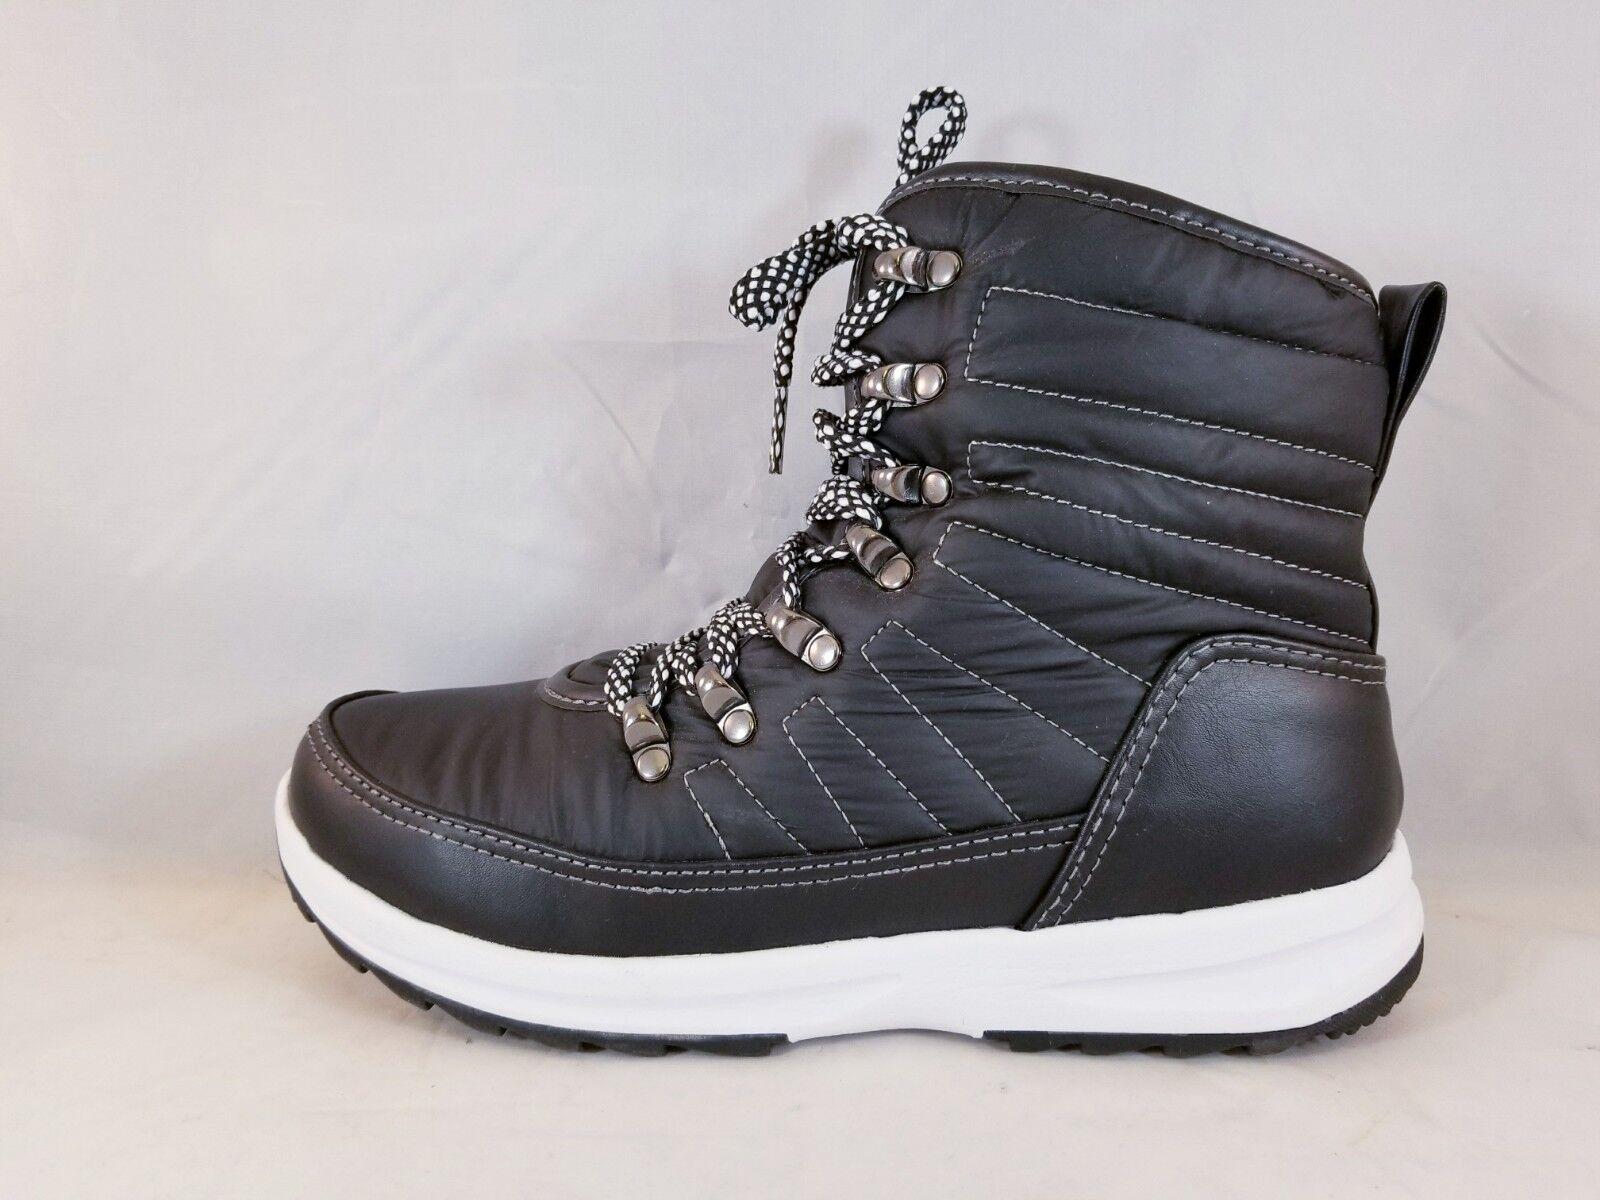 Weatherproof Alexa Women's Boots 1132649 Size 9